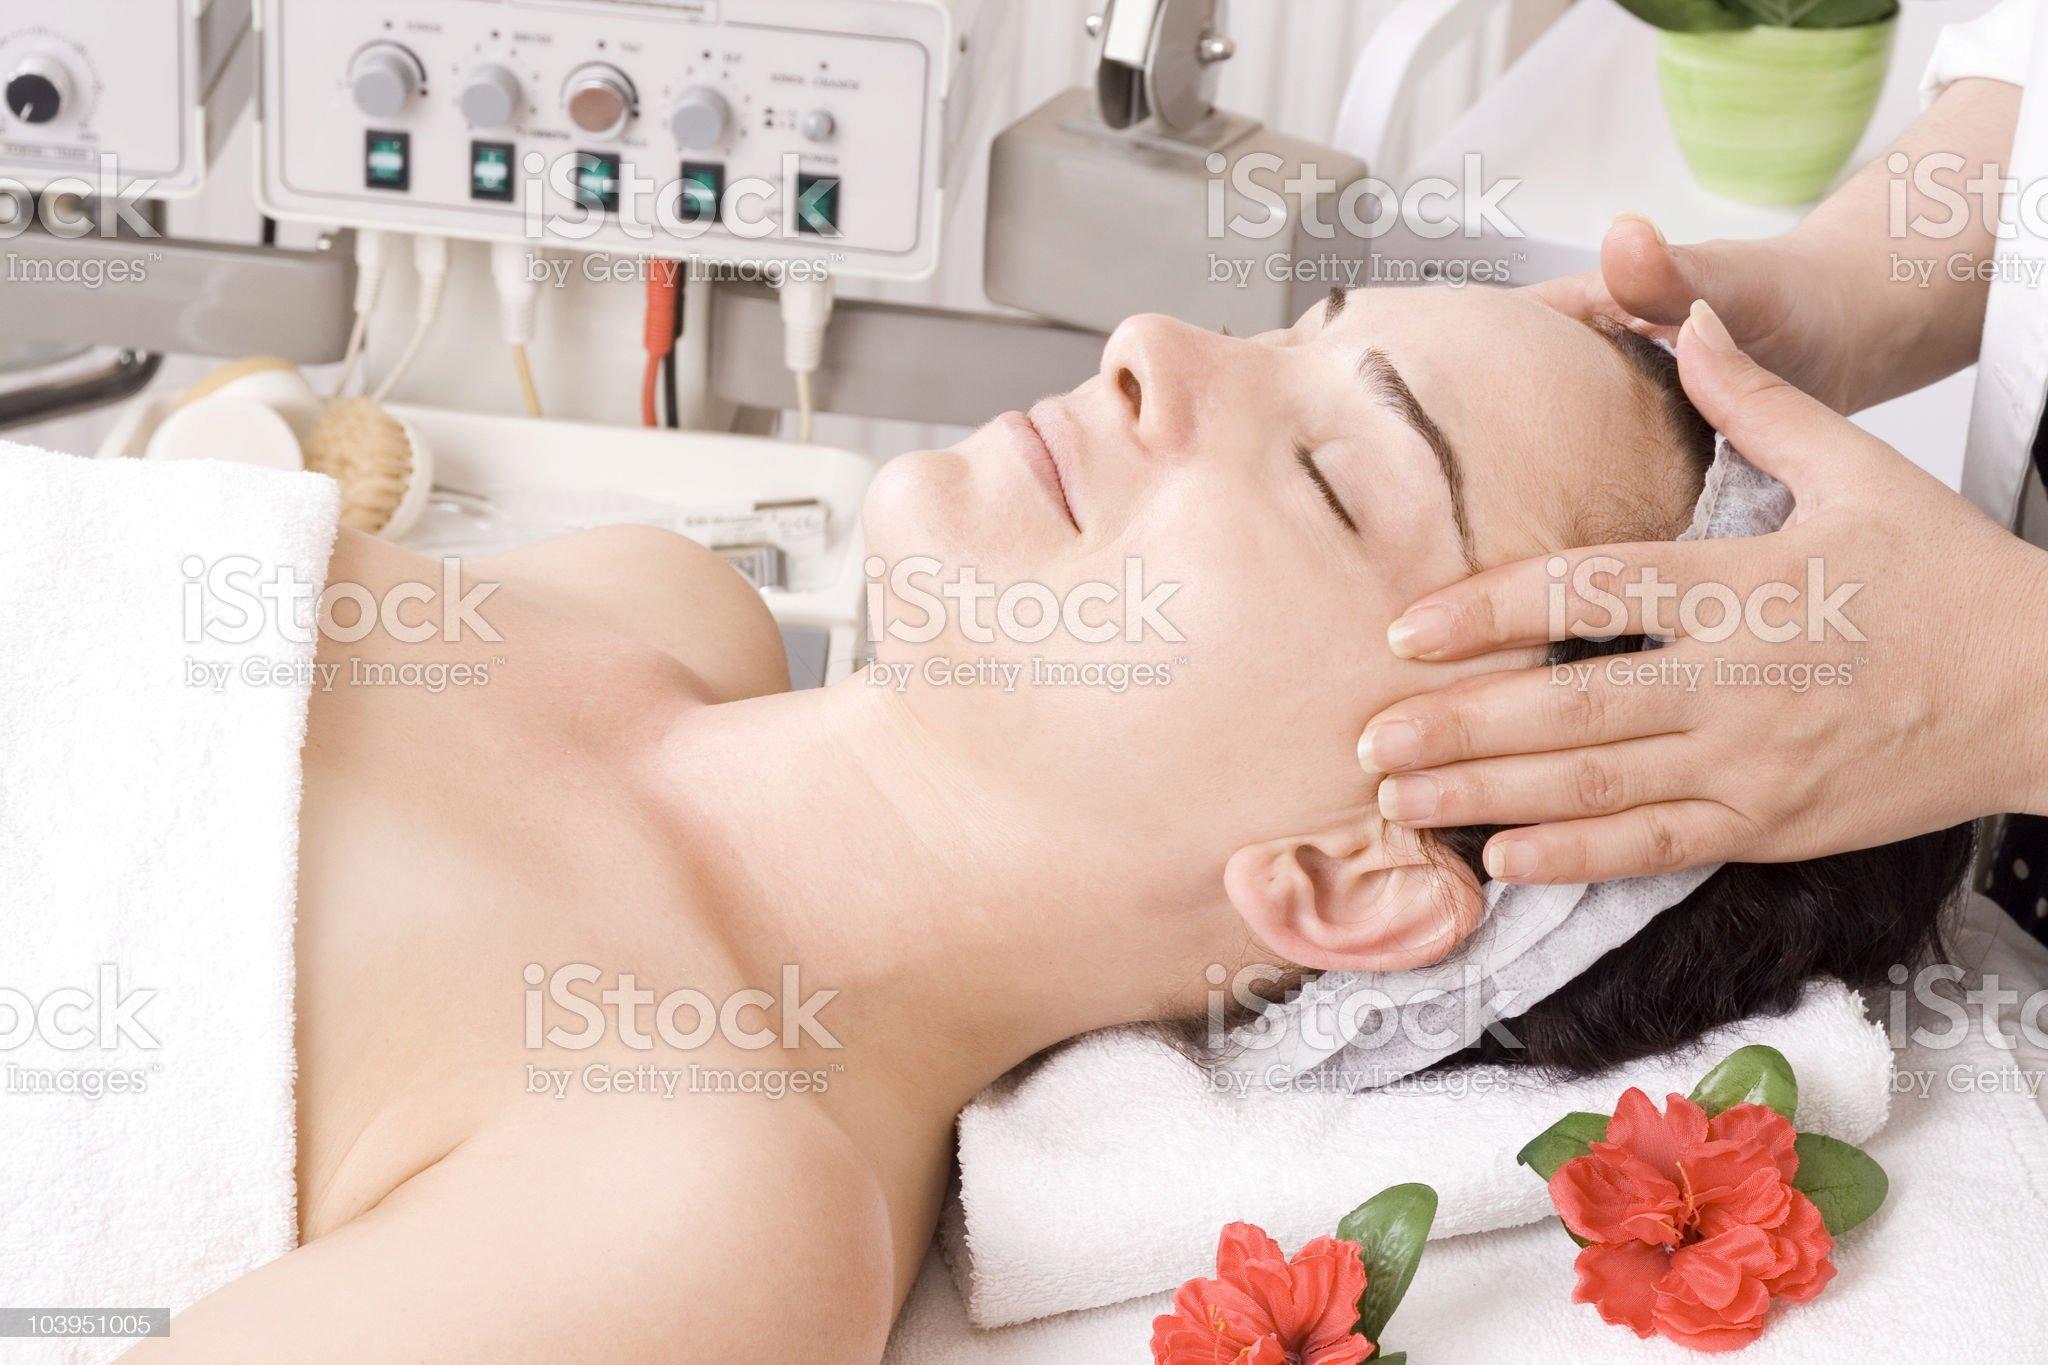 Getting Massage royalty-free stock photo